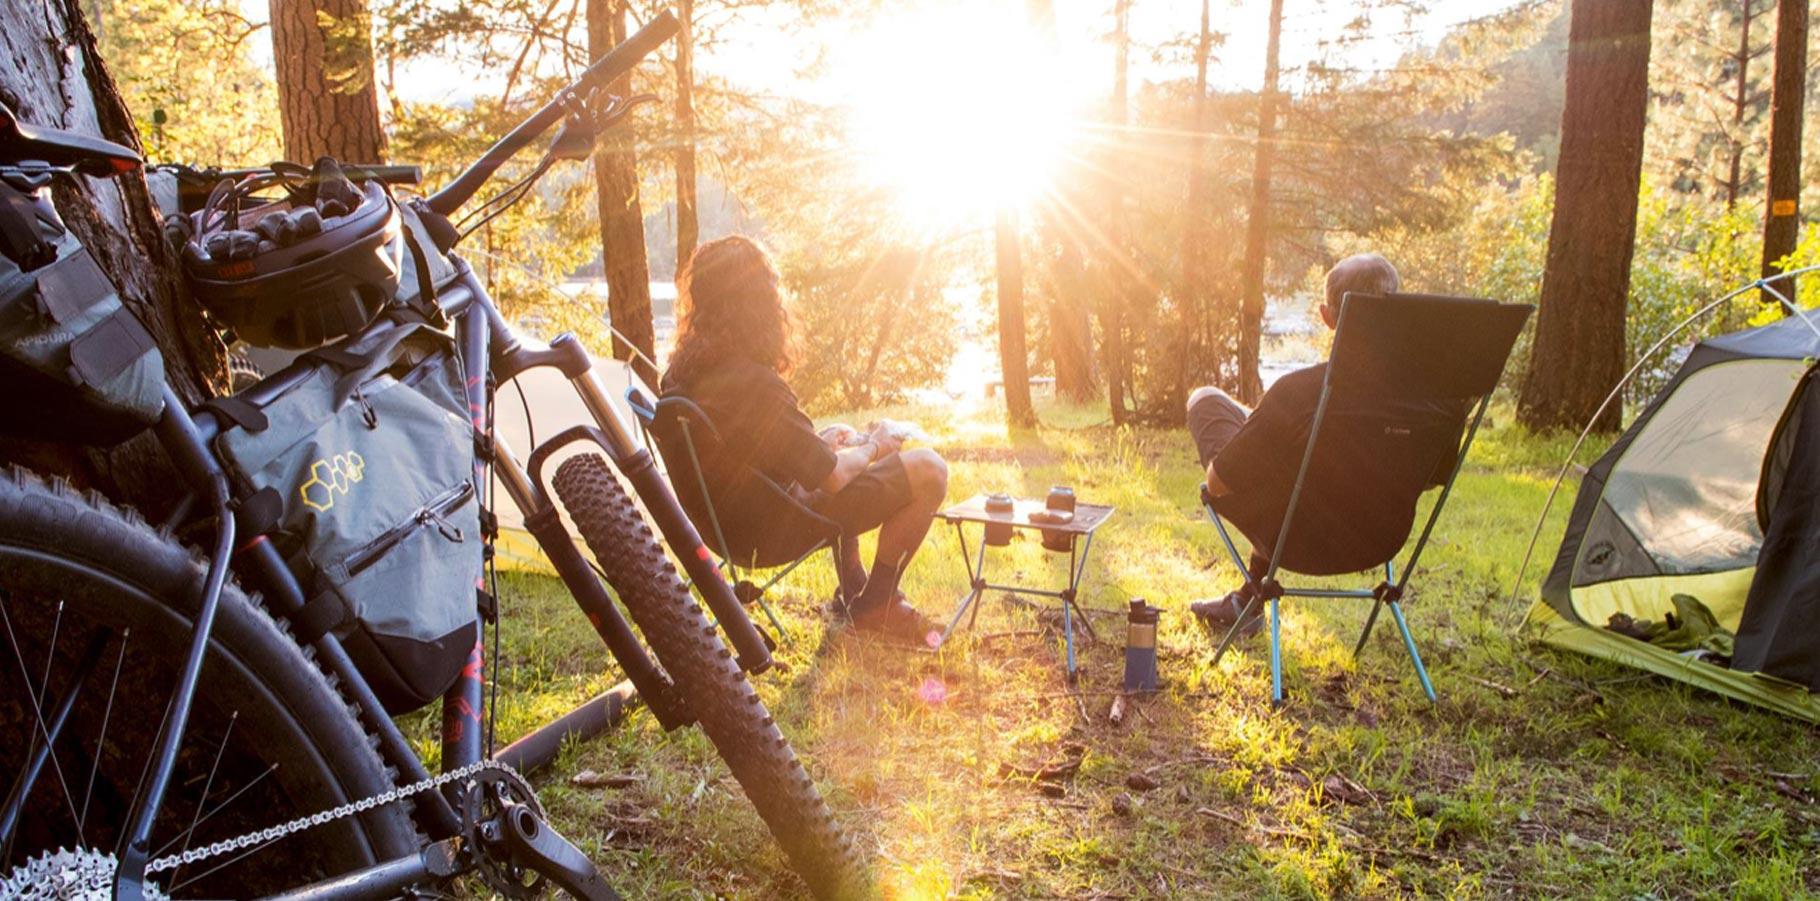 Apidura-bikepacking-brasny